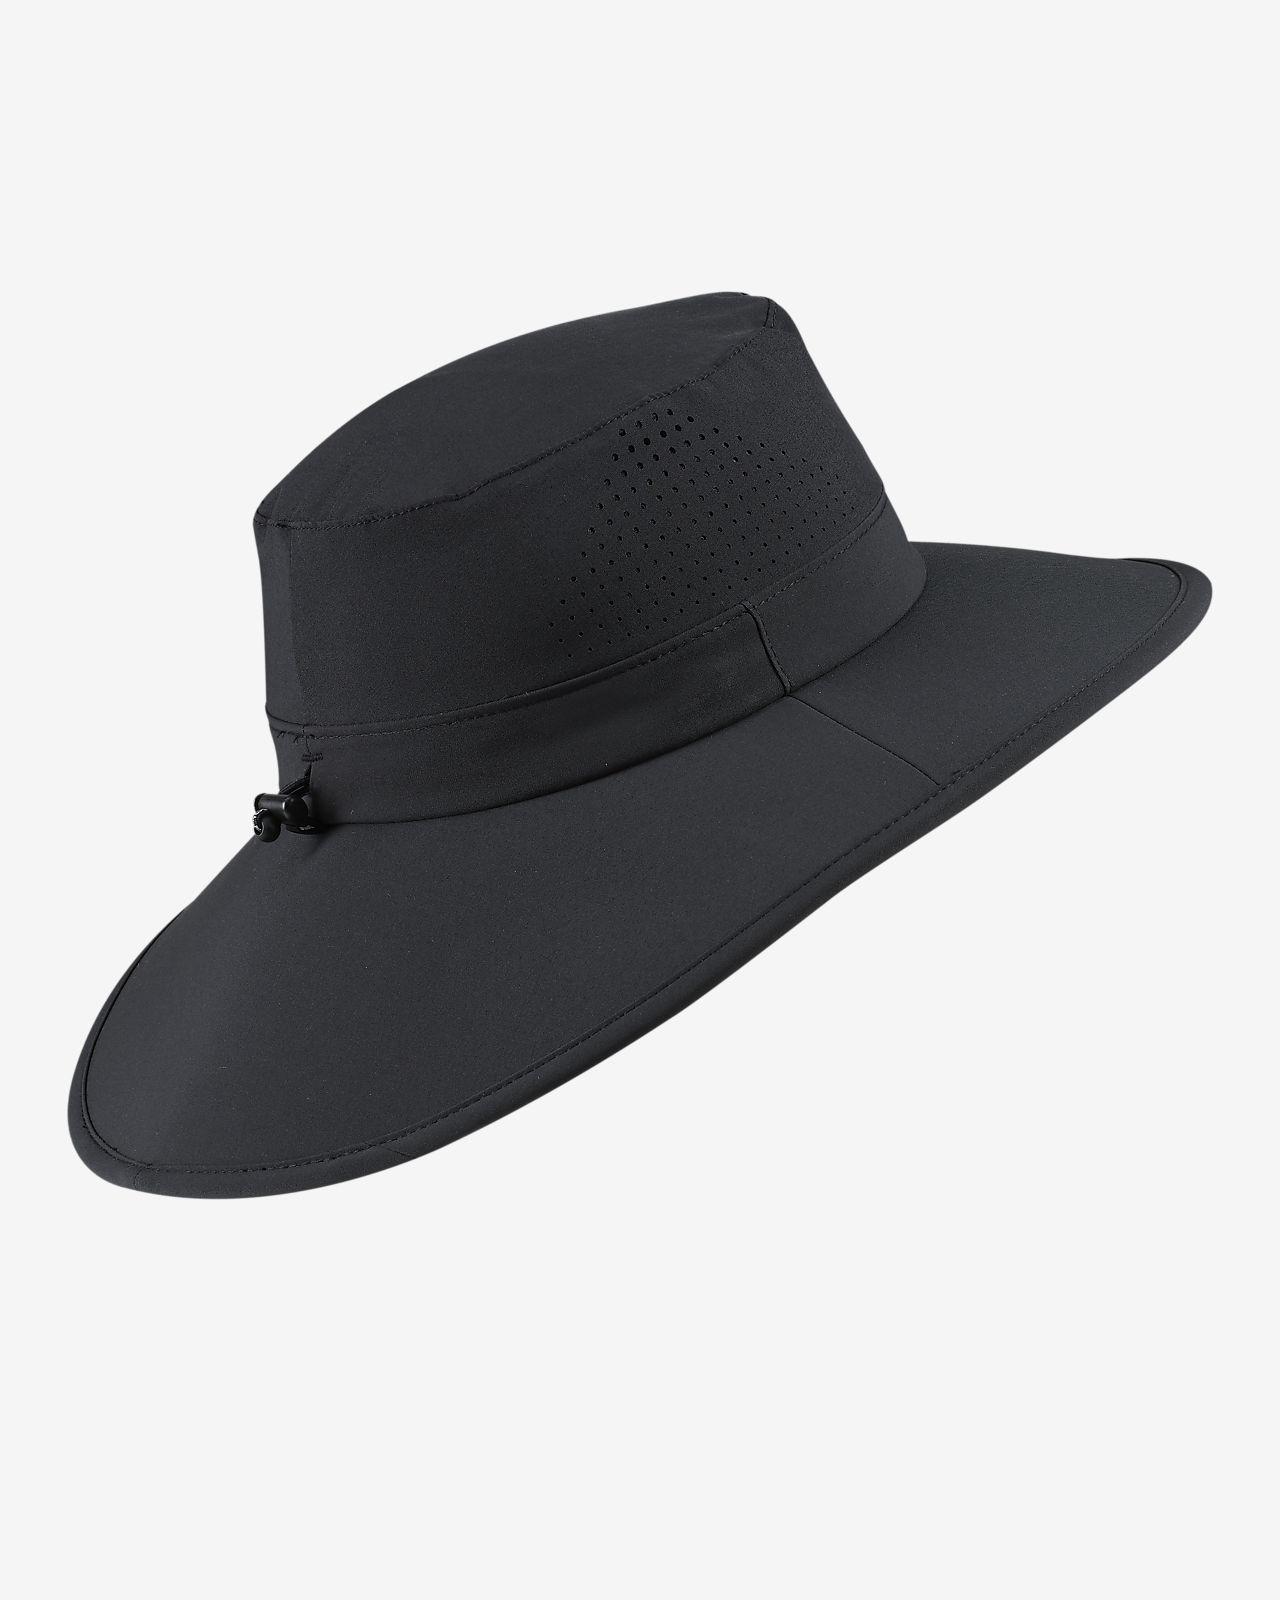 5bbf84c7f44 Nike Sun Protect Golf Hat